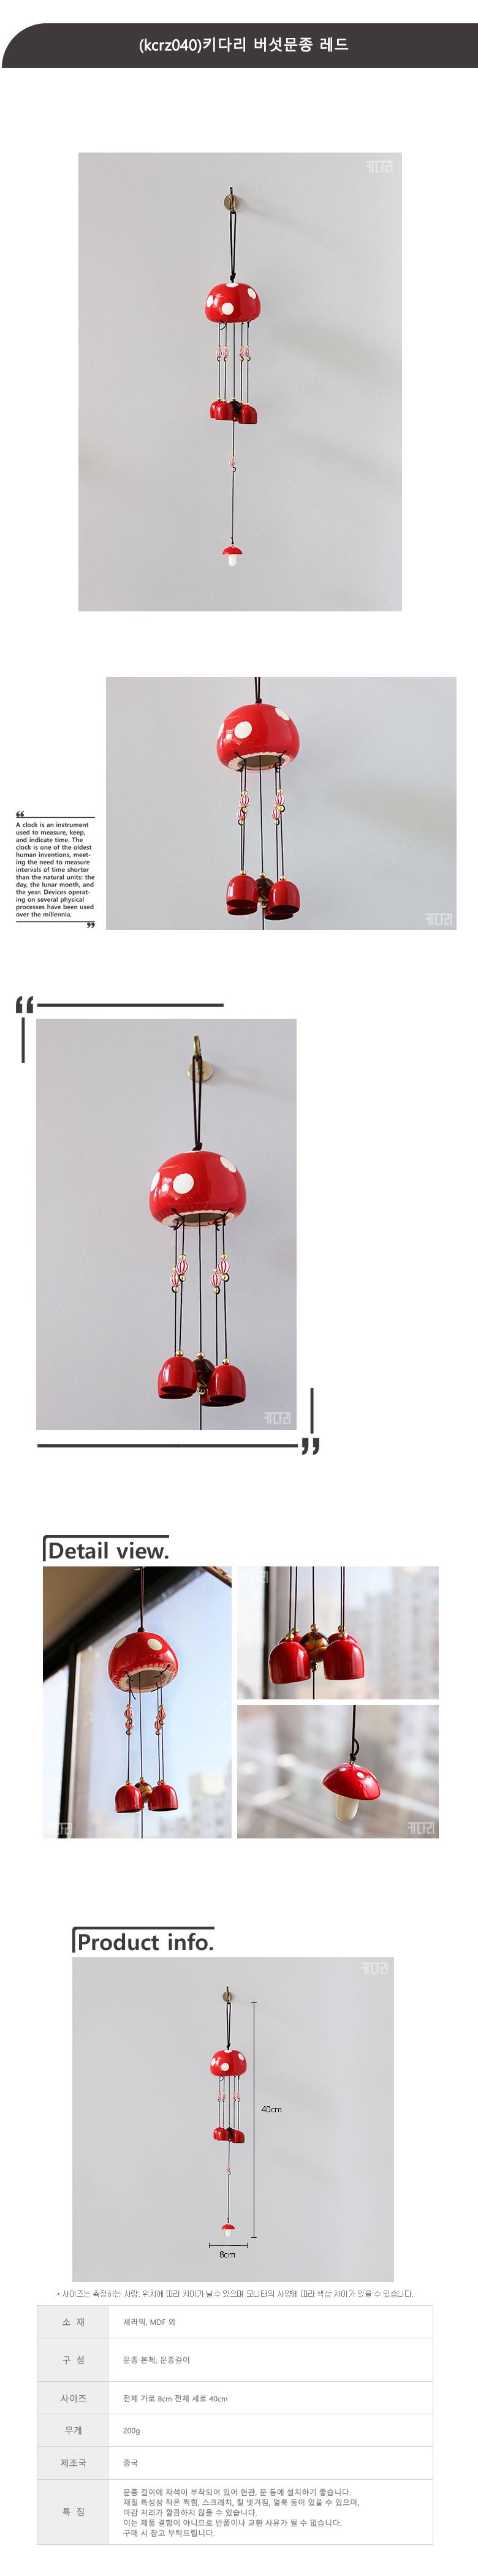 (kcrz040)키다리 버섯문종 레드 - 키다리, 10,400원, 장식/부자재, 벽장식